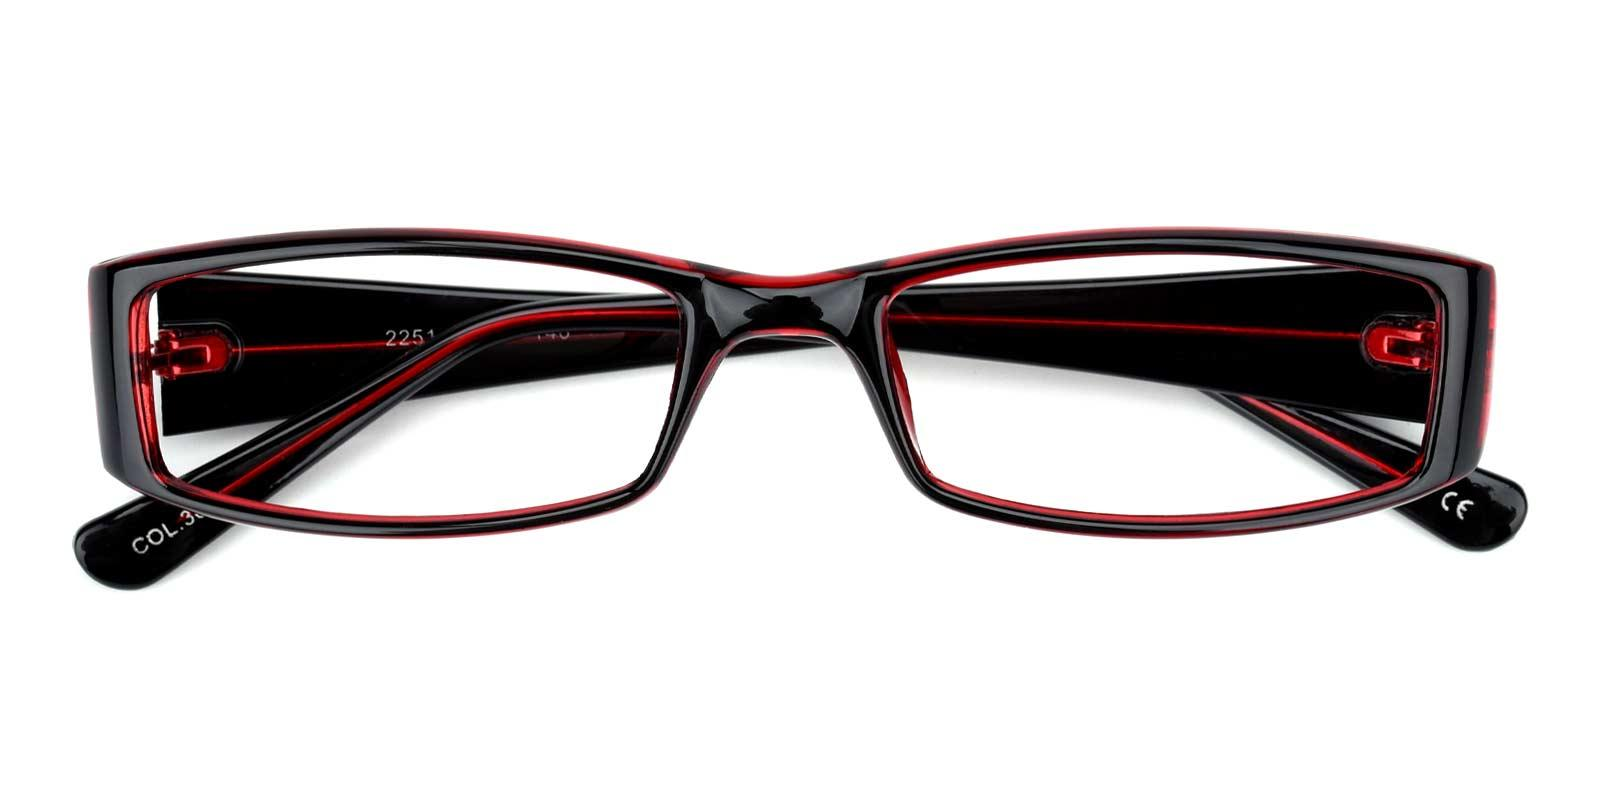 Tot-Red-Rectangle-Plastic-Eyeglasses-detail